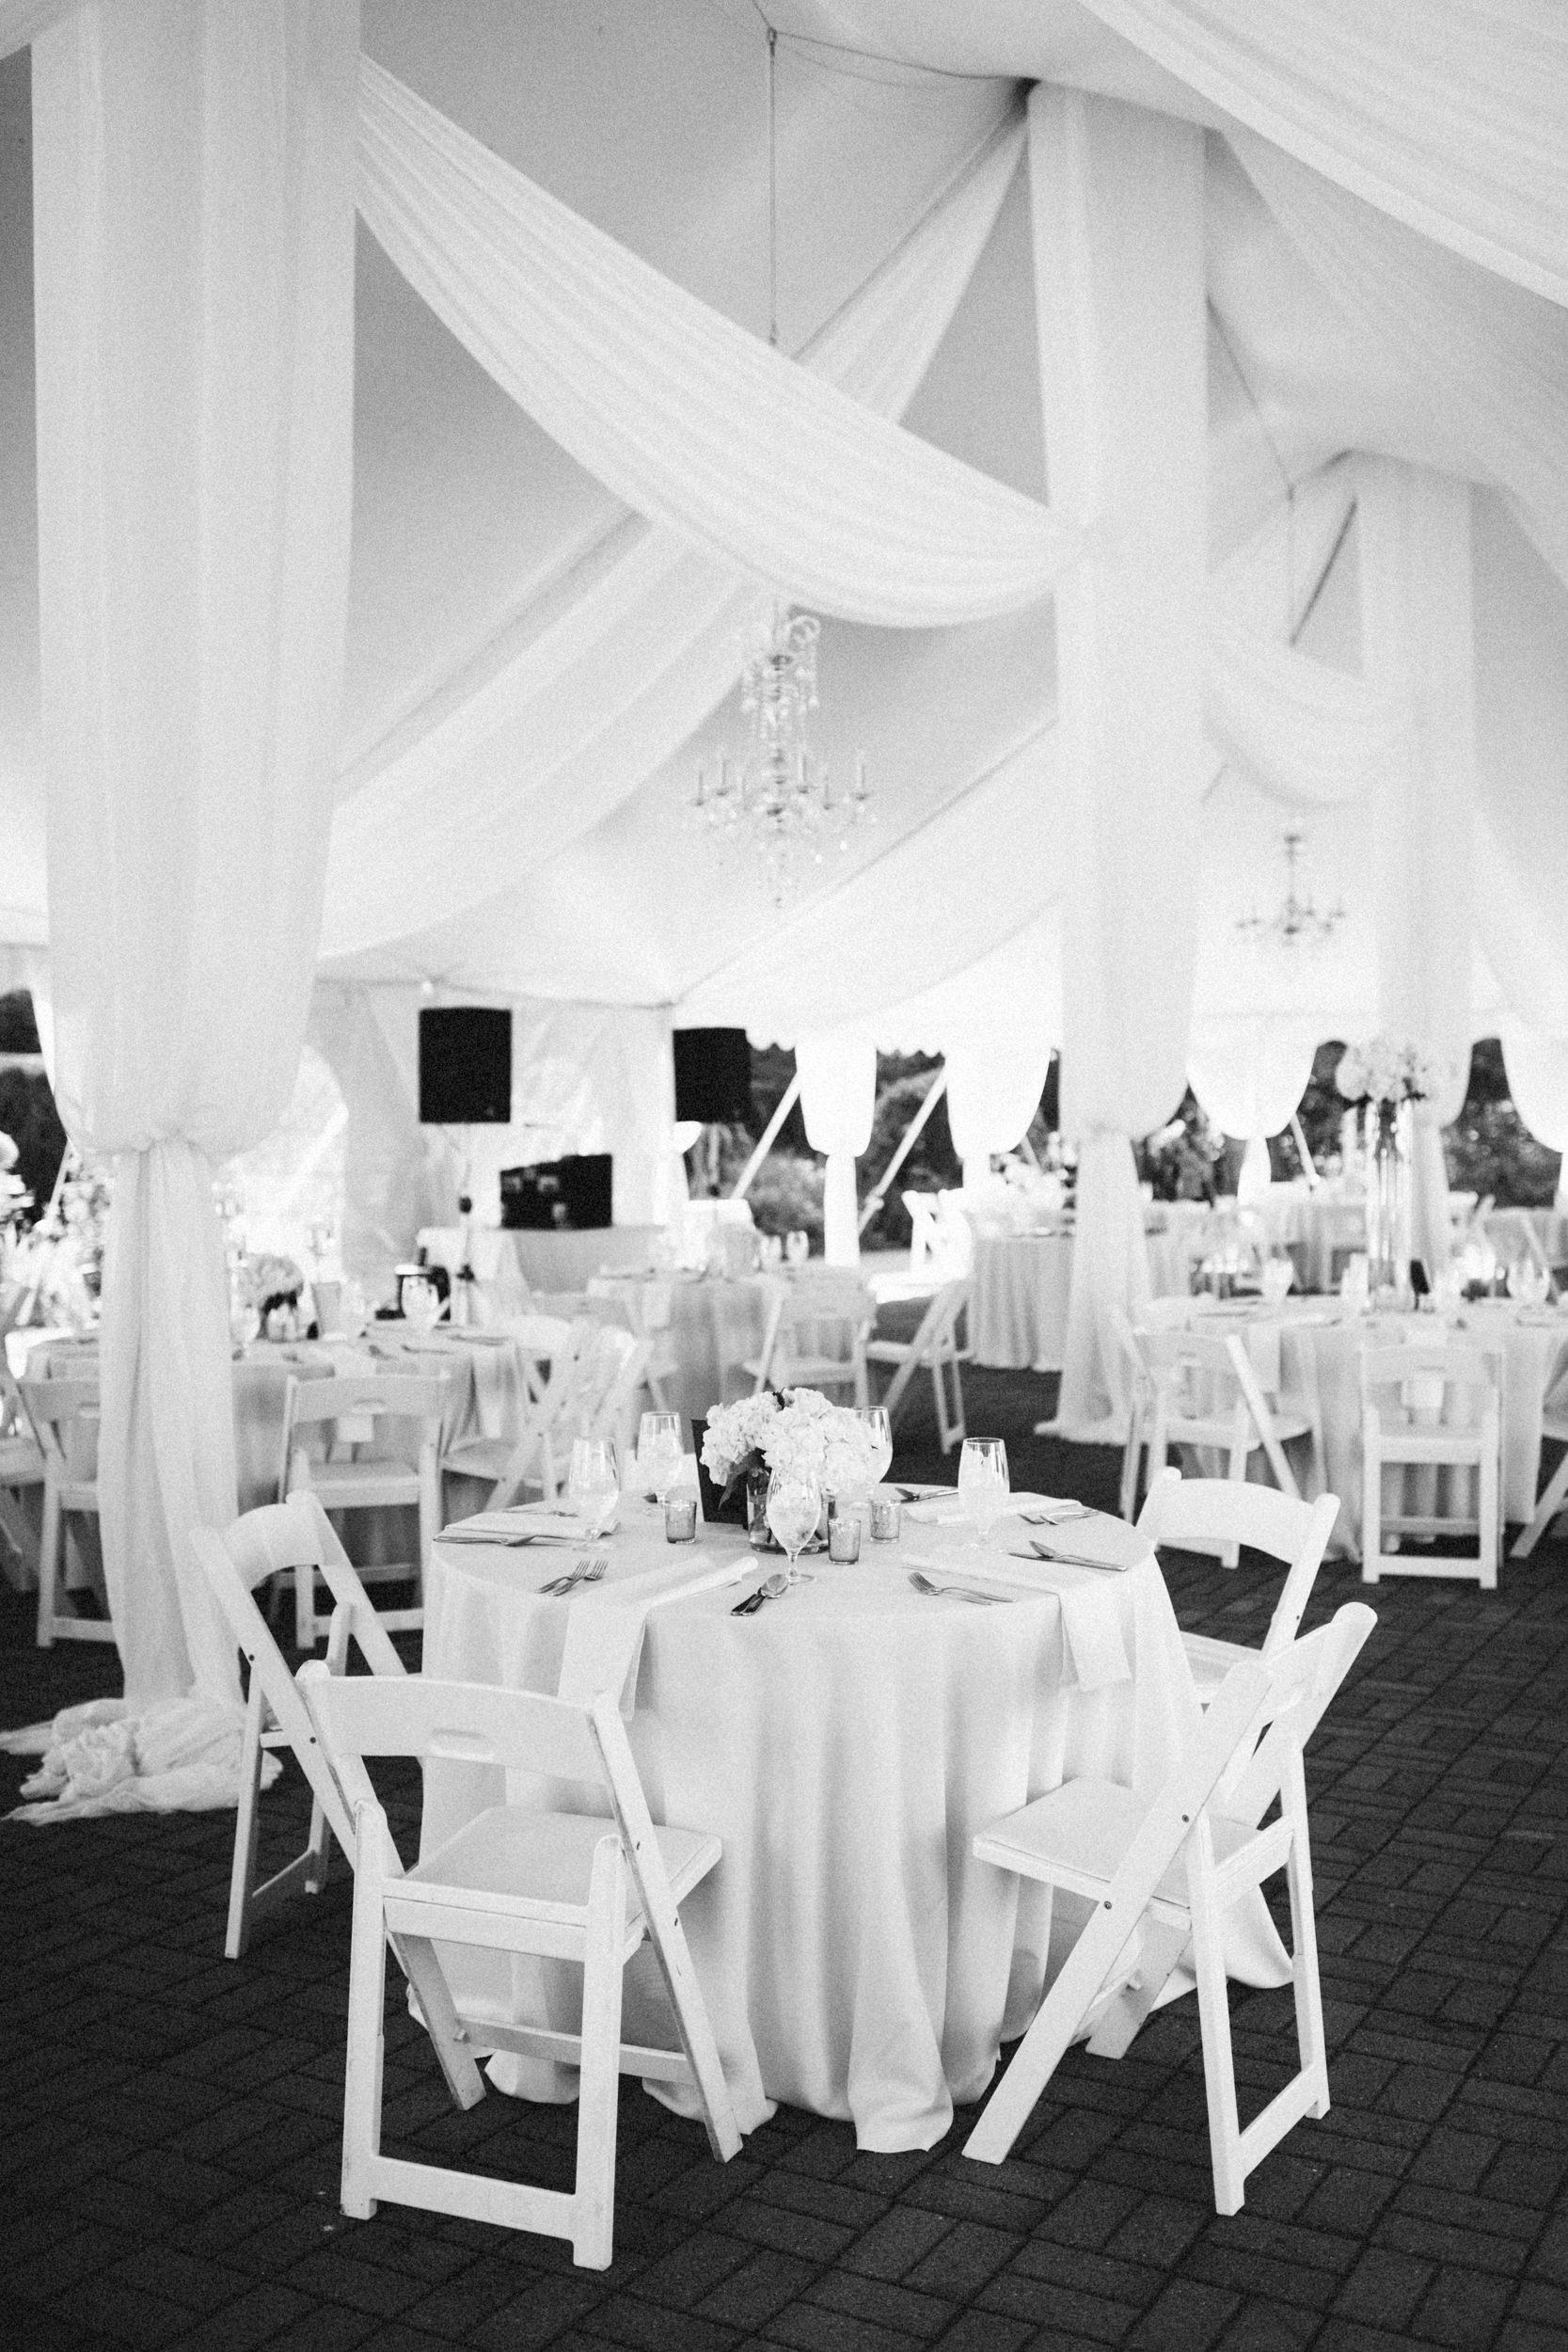 Louisville-Kentucky-Wedding-Elopement-Photographer-Sarah-Katherine-Davis-Photography-Whitehall-Classic-Timeless-Garden-Wedding-271.jpg